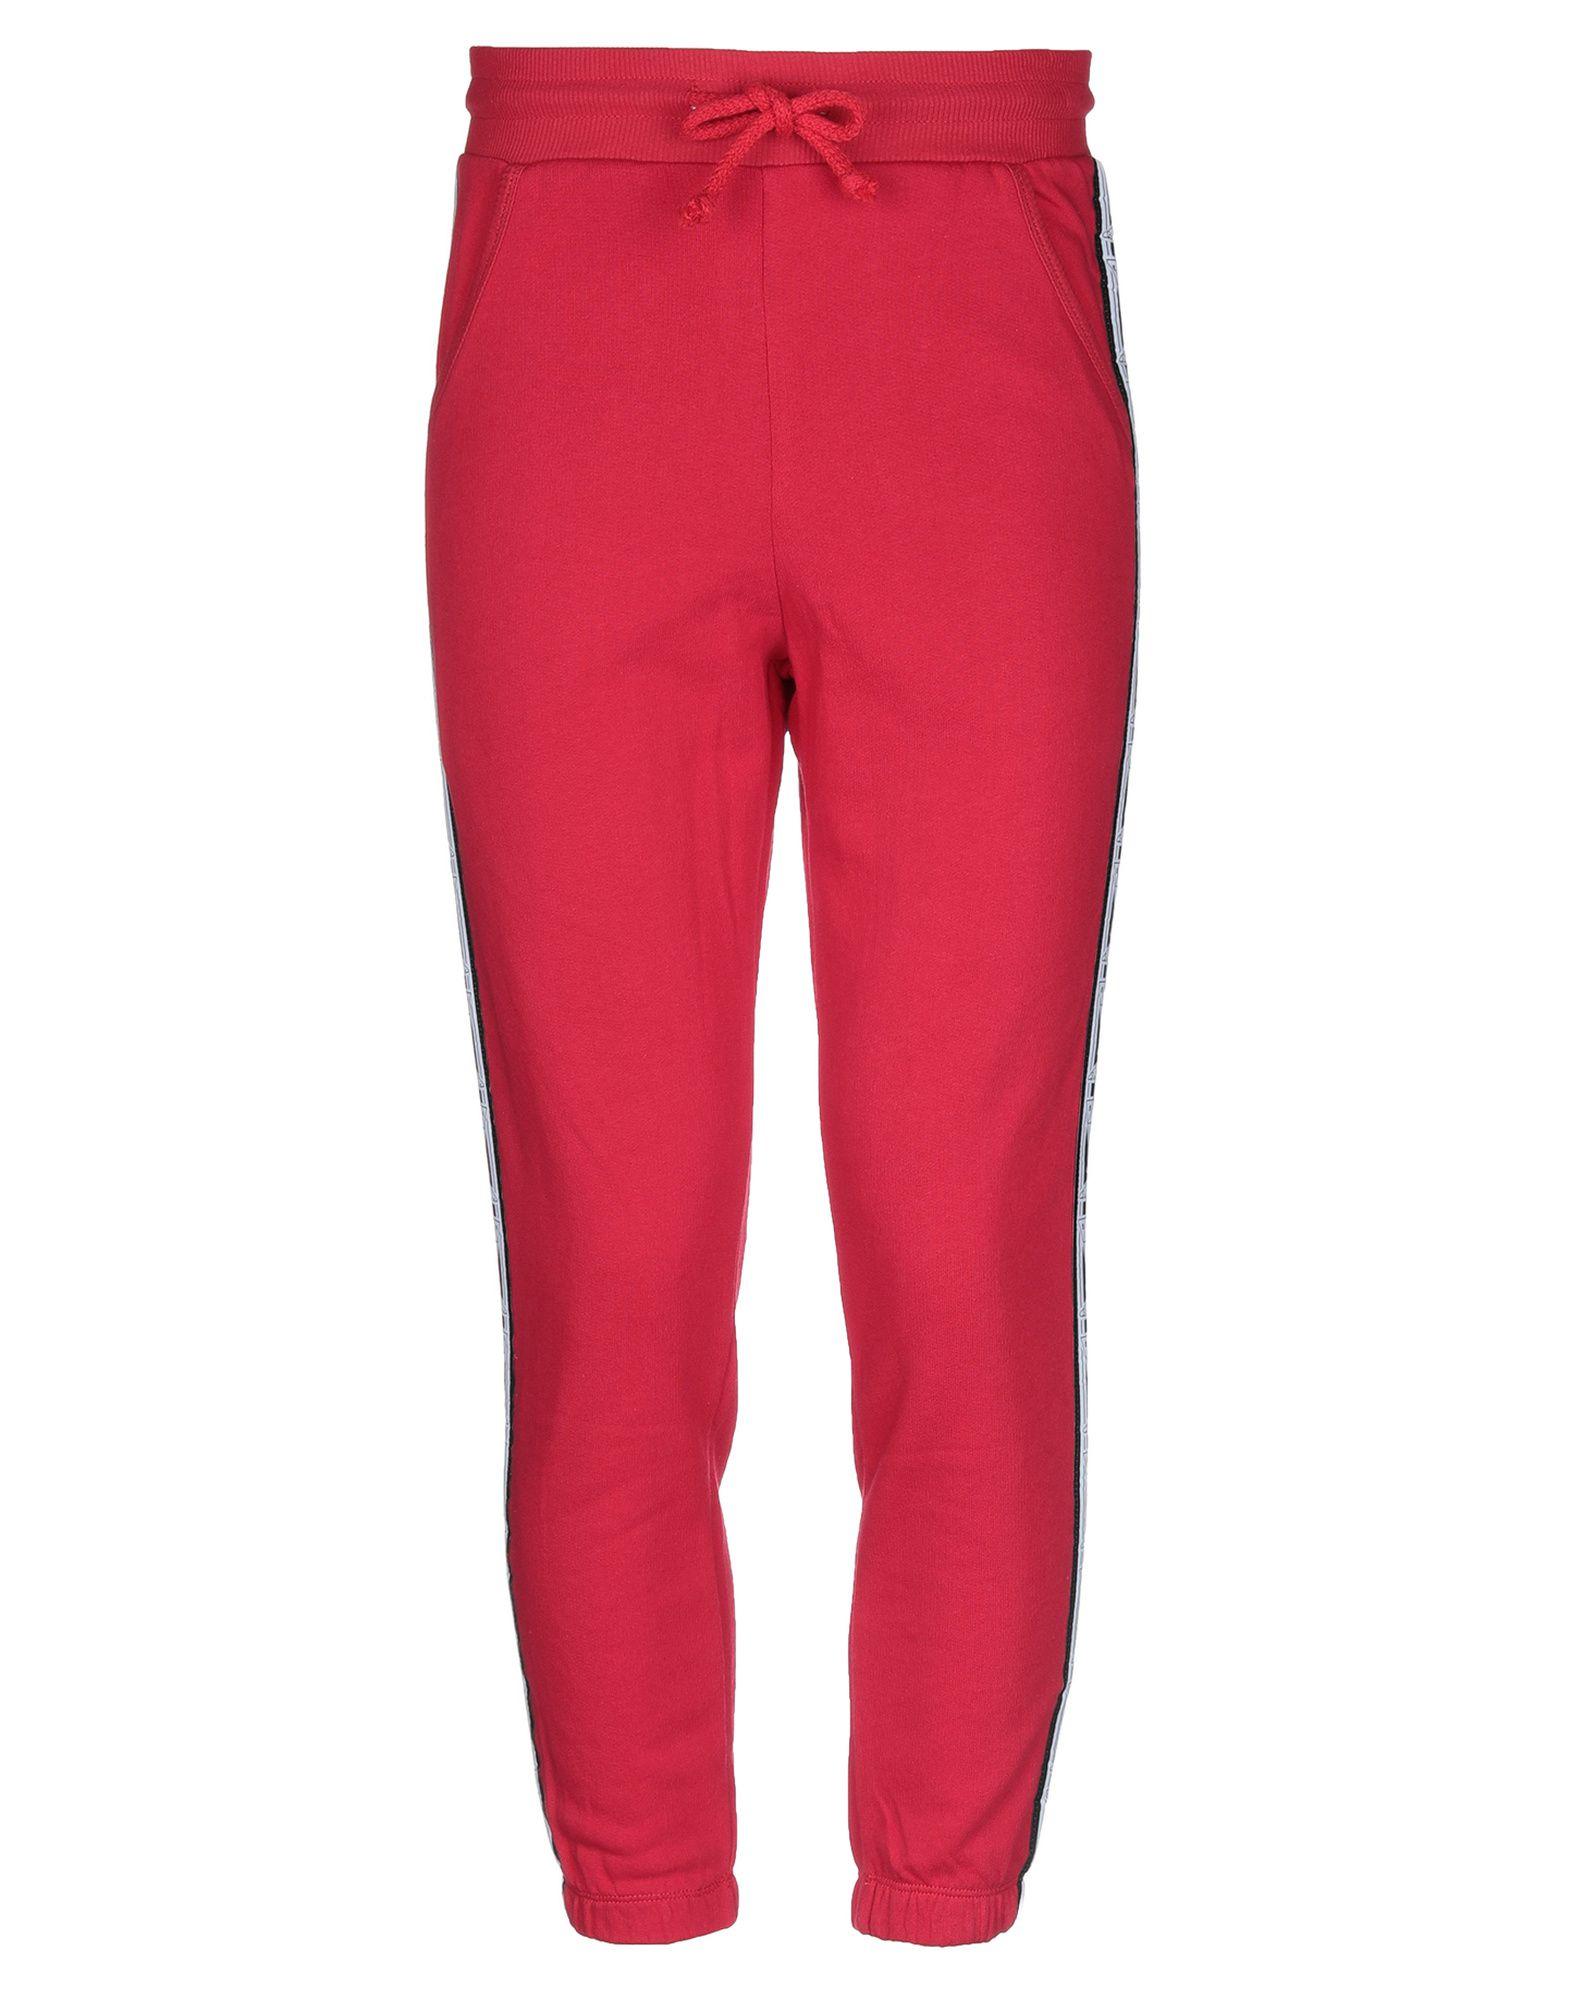 Pantalone Pantalone Berna uomo - 13305173QU  beste Qualität zum besten Preis